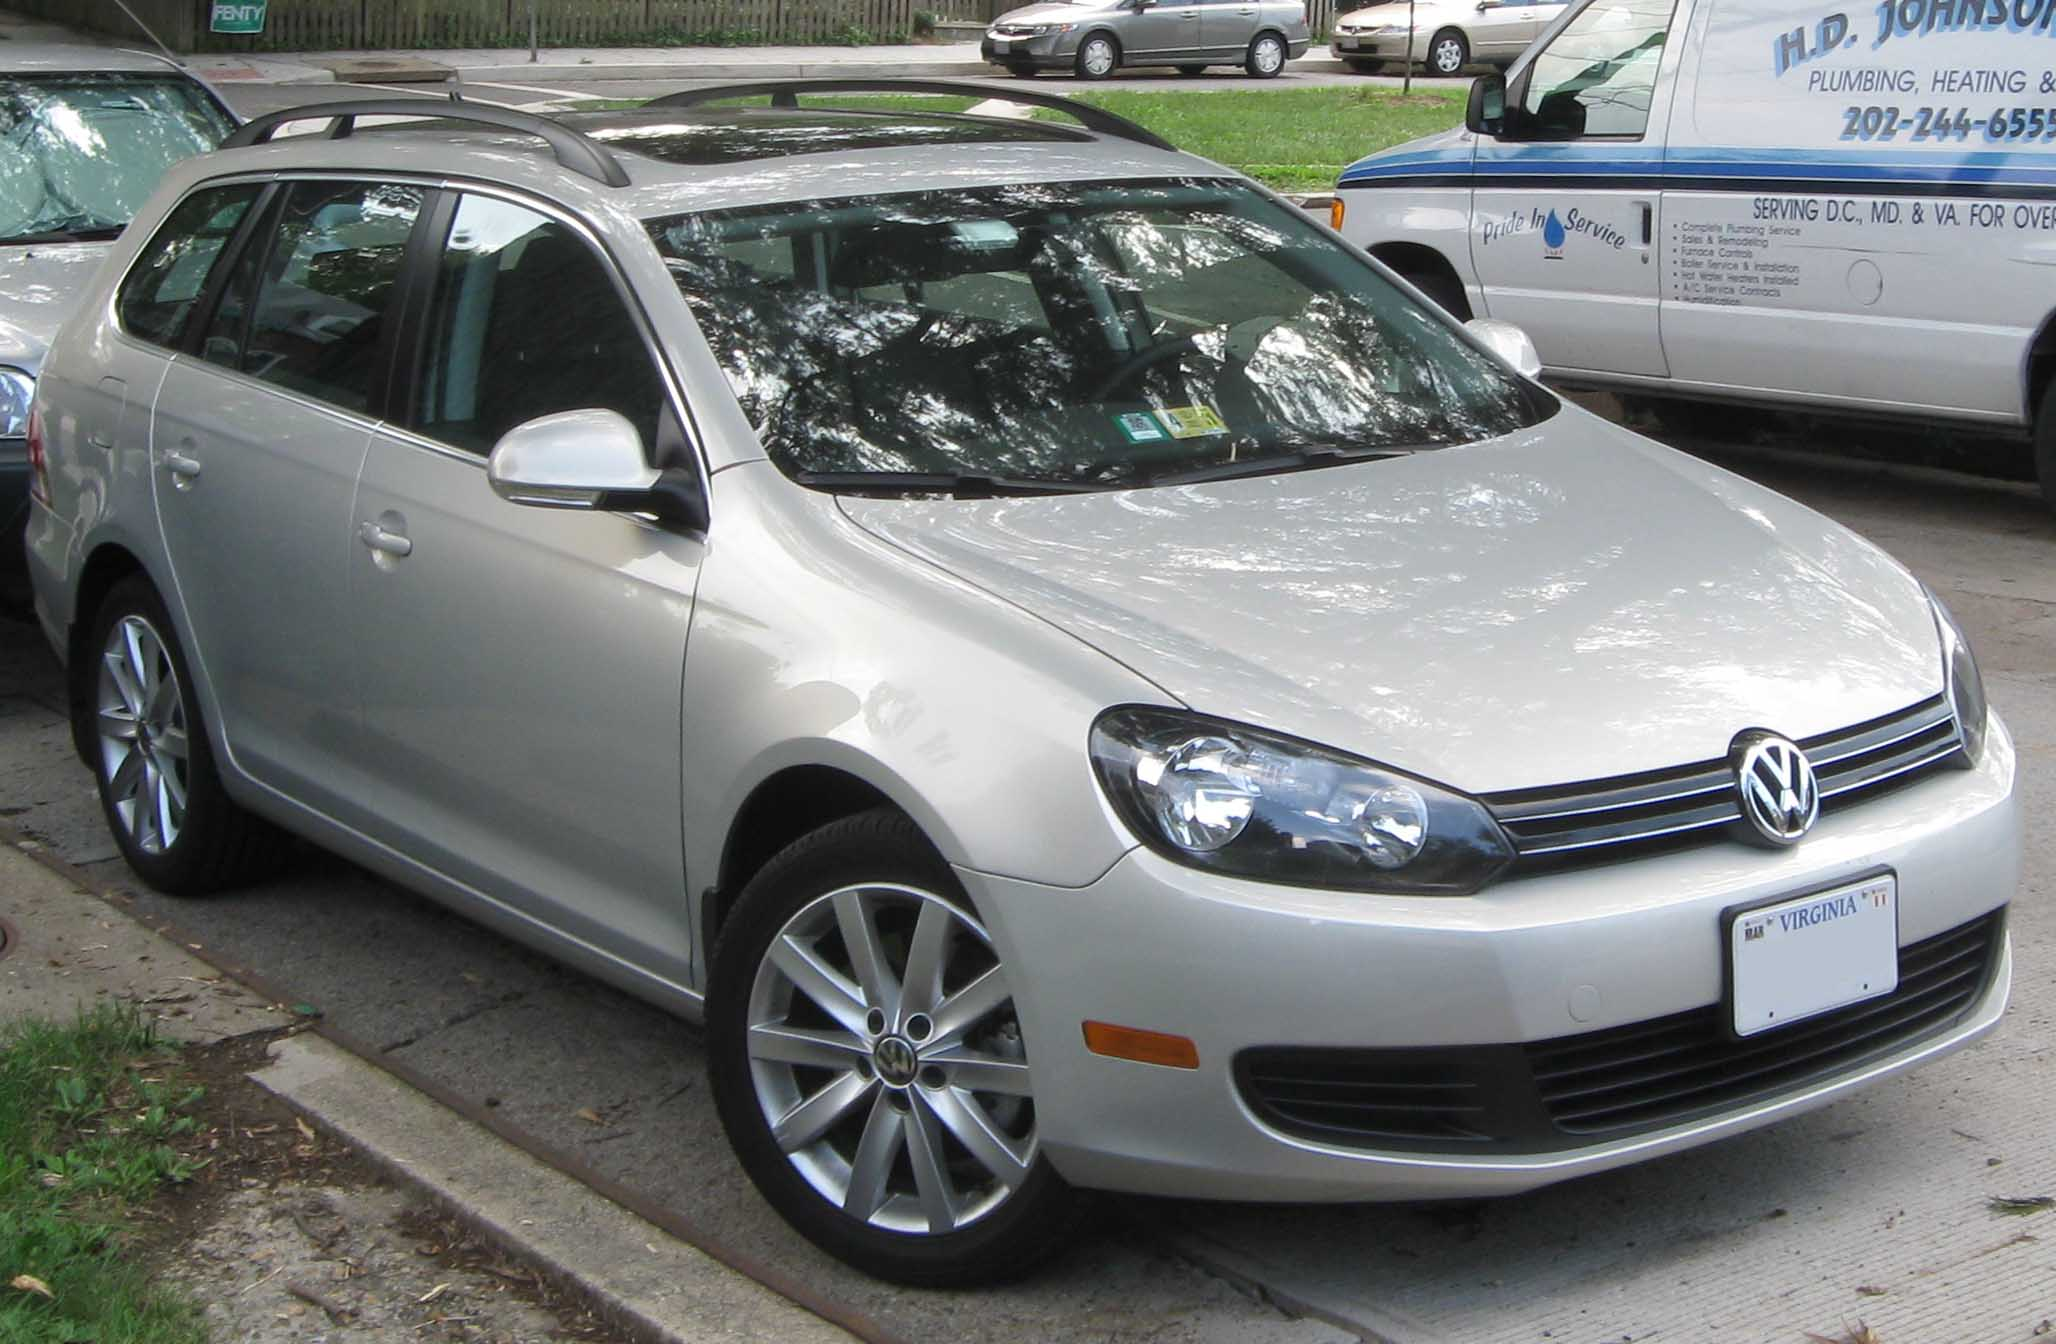 2010 Volkswagen Jetta Sportwagen Tdi Review | New Cars Review For 2013